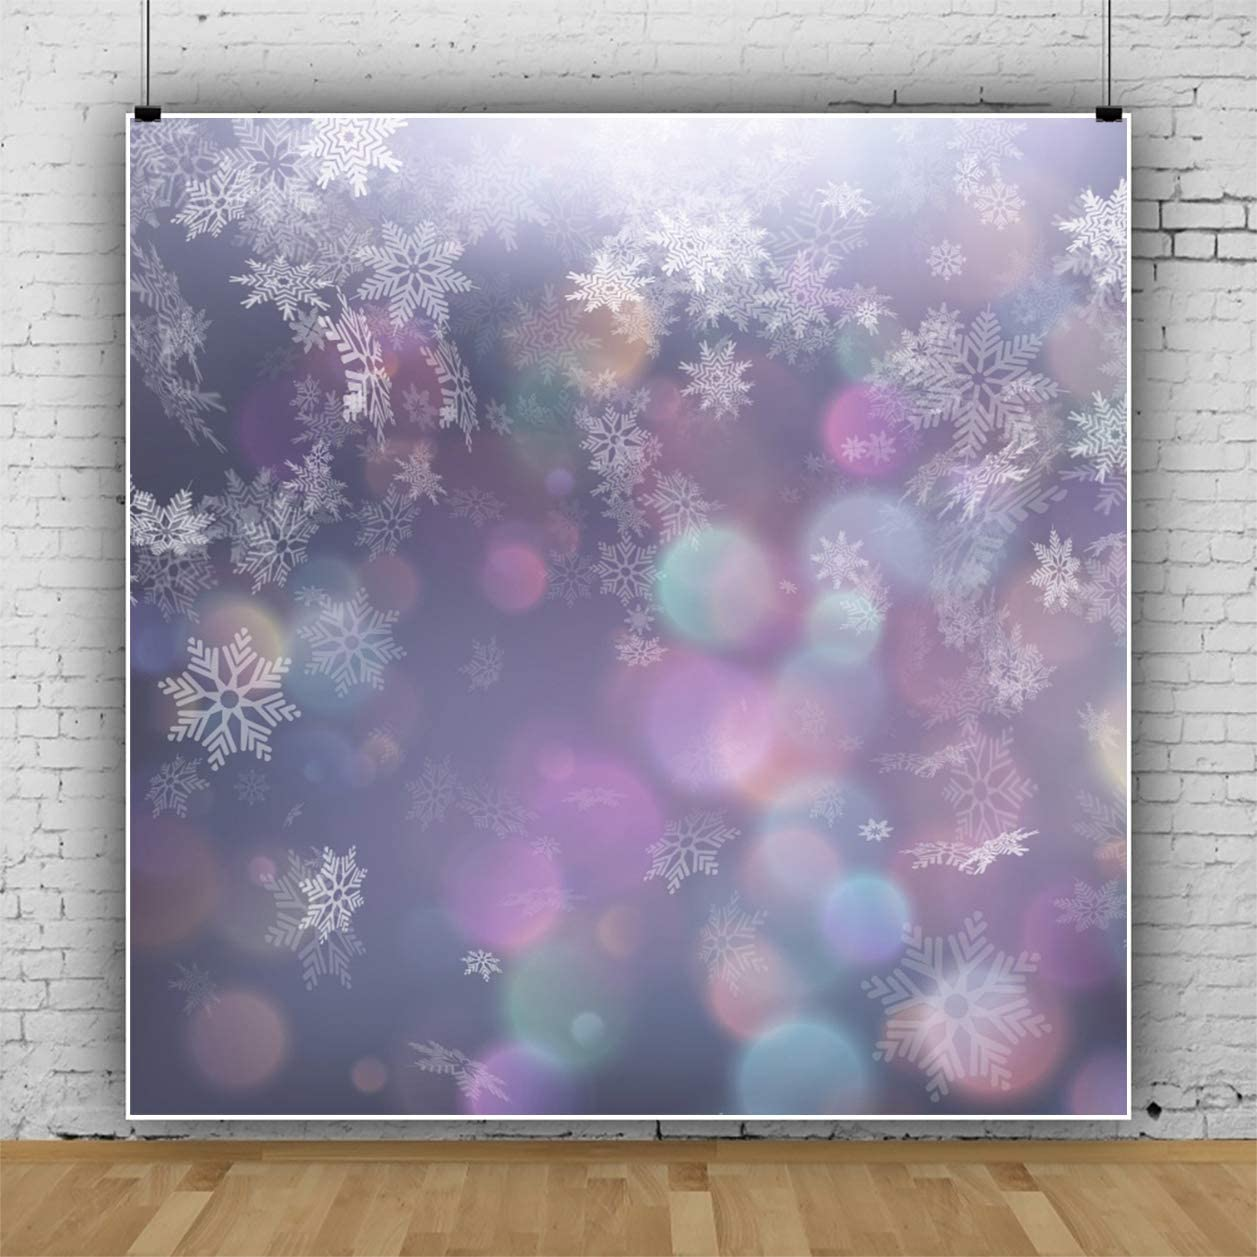 Haoyiyi 4x4ft Winter Wonderland Backdrop Snowflake Bokeh Glitter Dots Vintage Background Photography Photo Pets Network Anchor Channel Video Birthday New Year Wedding Photoshoot Supplies